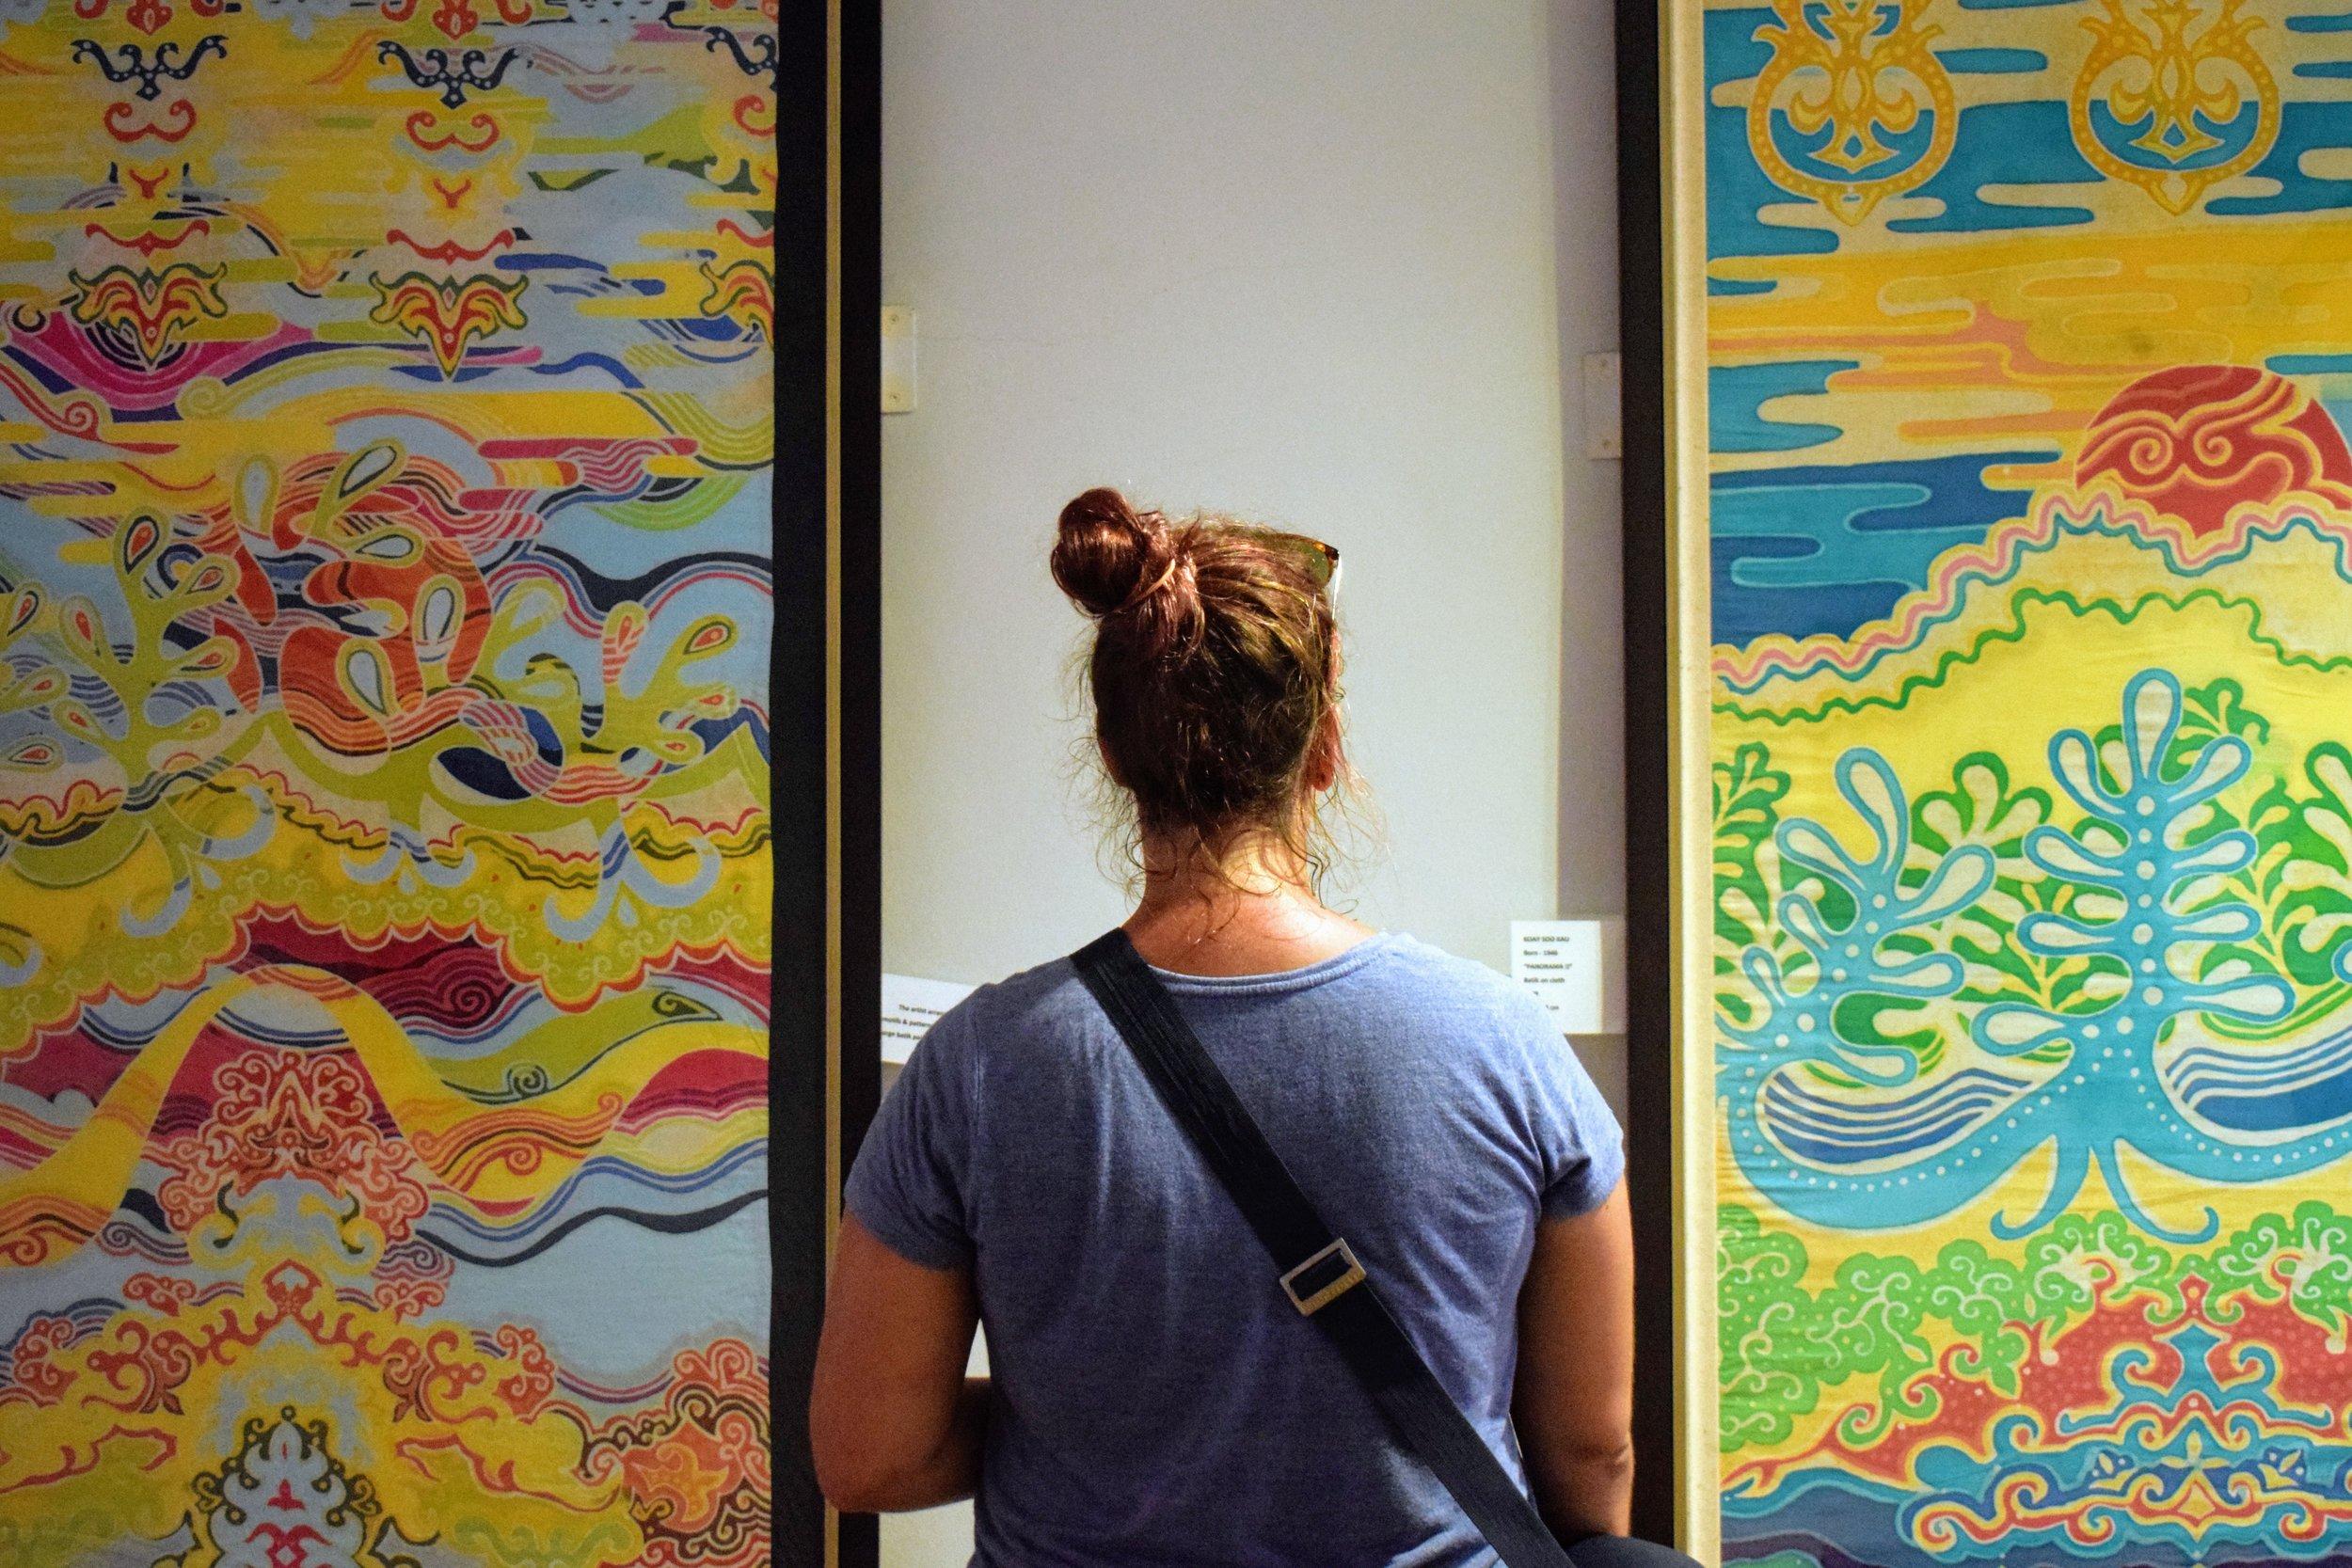 Checking out some very cool batik paintings at Batik Painting Museum Penang.